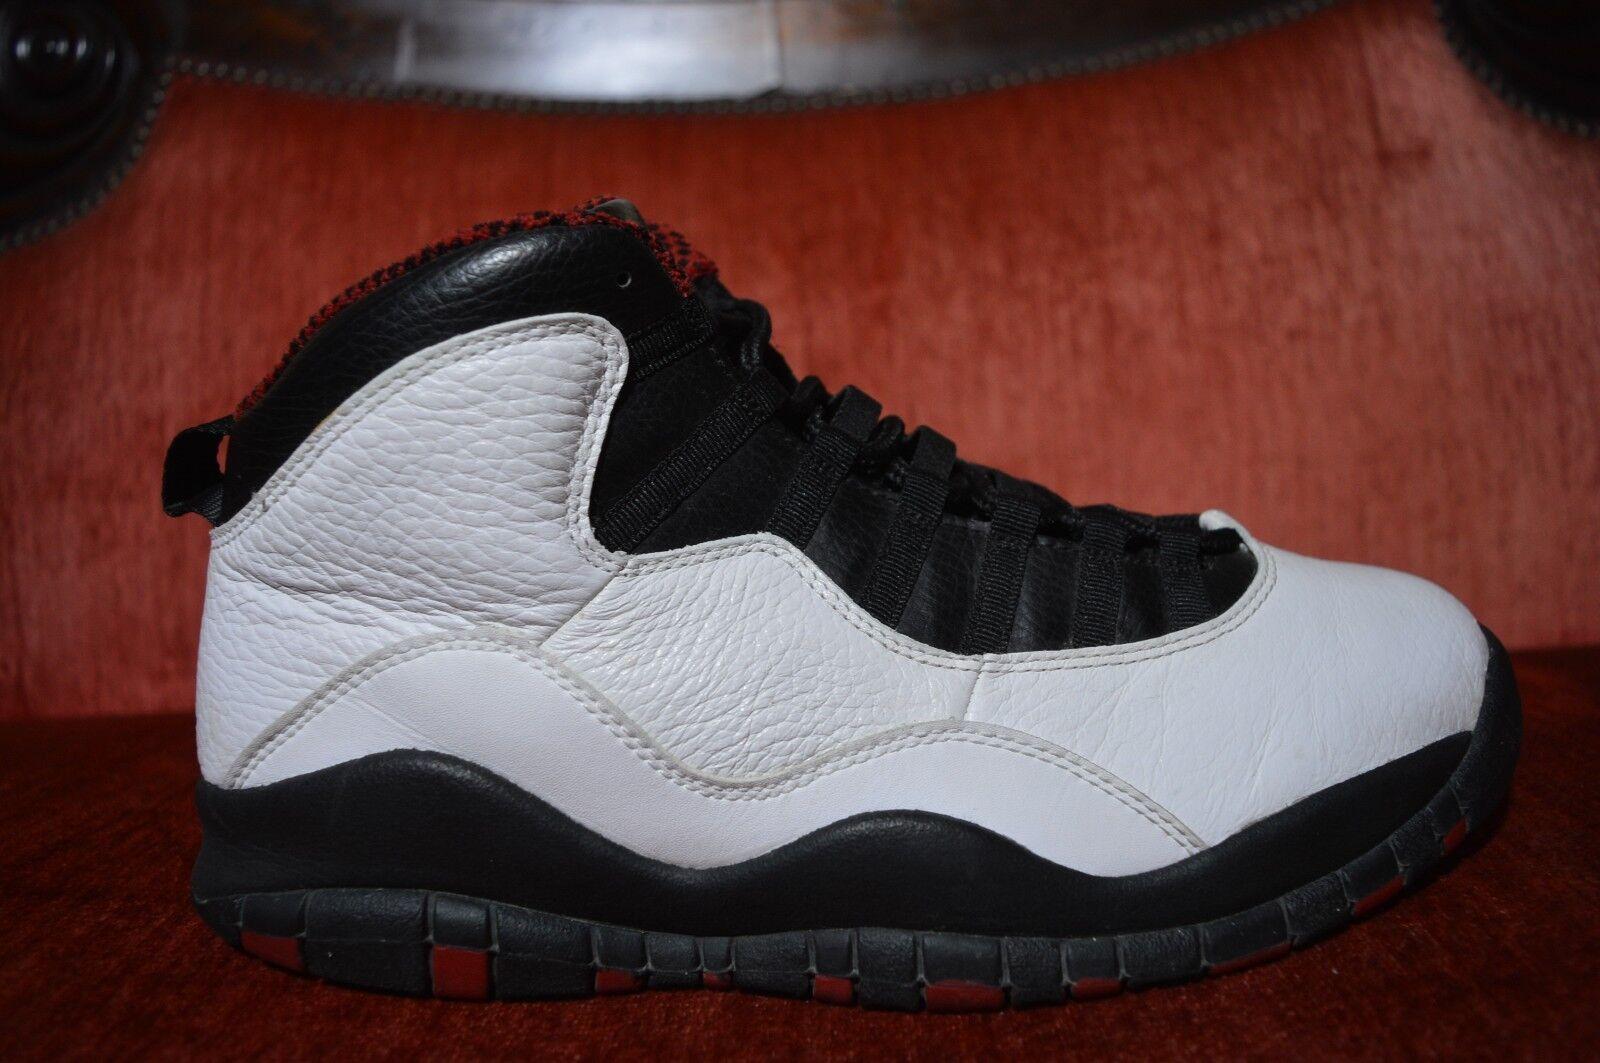 2018 Nike Air Jordan 10 x blanco, retro Chicago Bulls, negro, blanco, x tamaño 10,5 d99a71